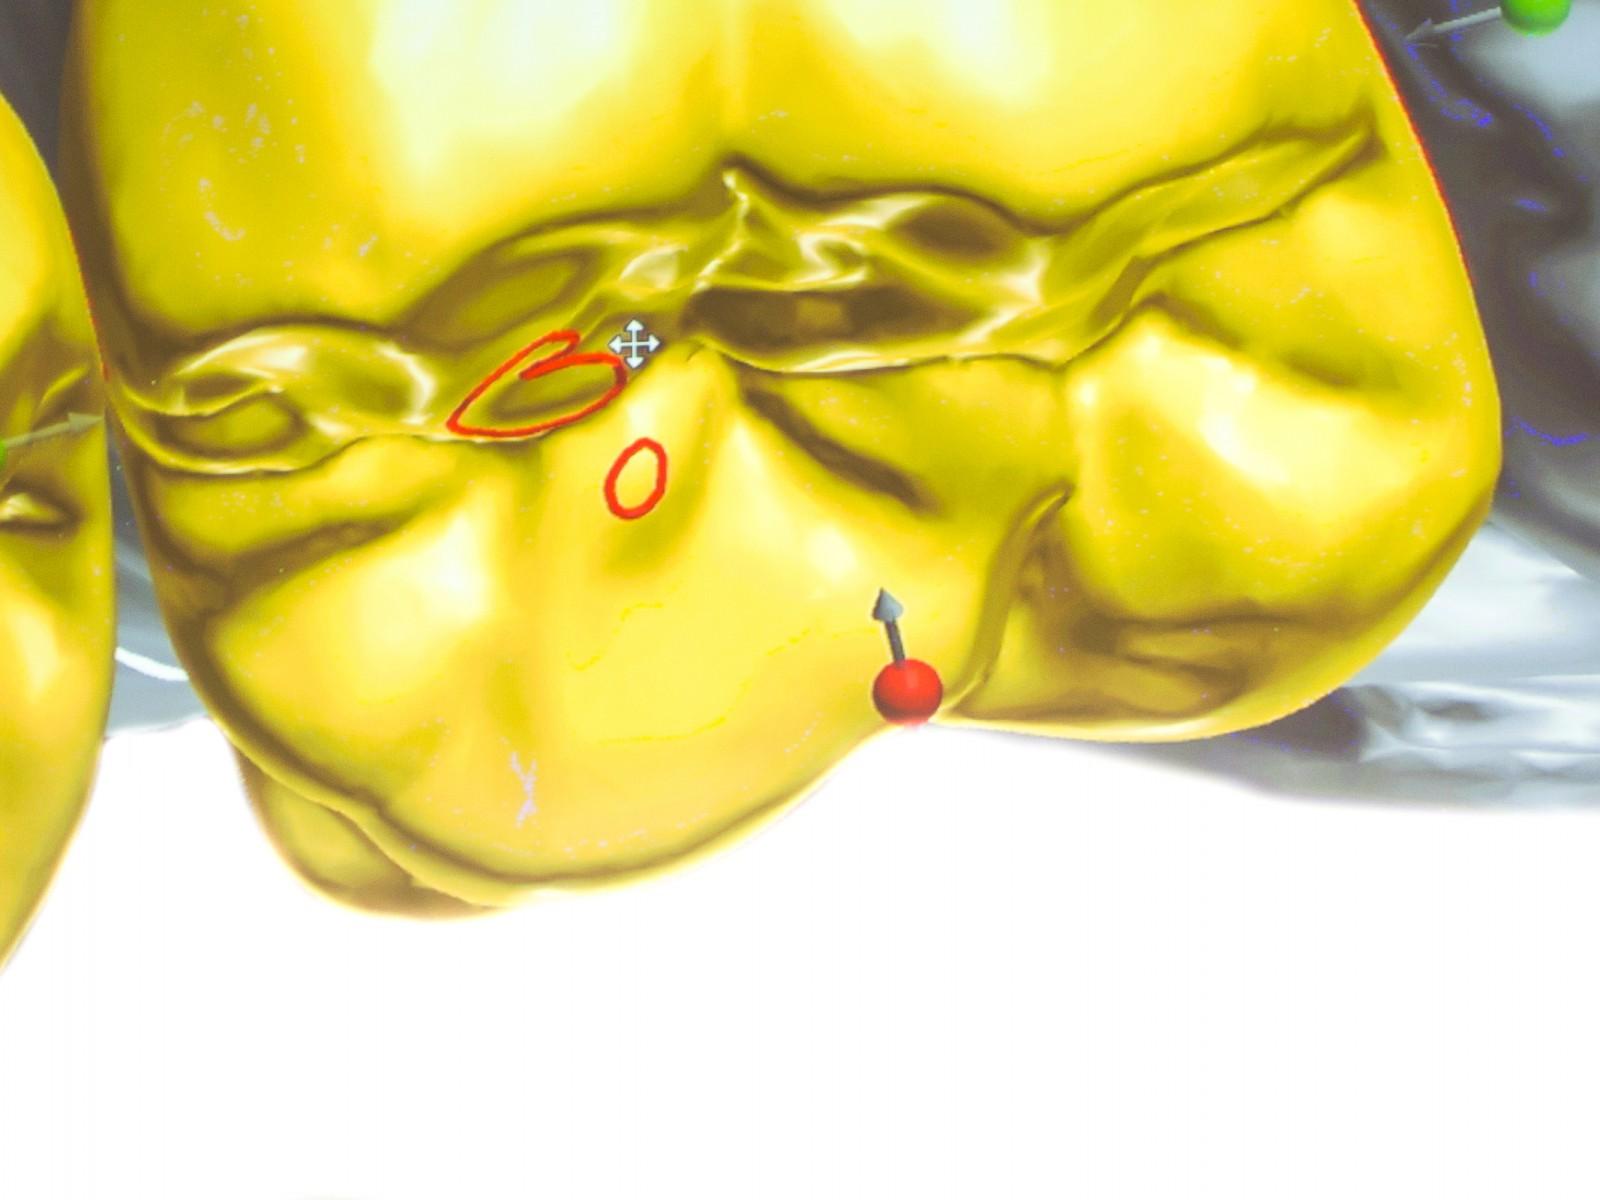 Zahntechnik Zahnmedizin Texte Schreiben Artikel Straumann Kongress Peters